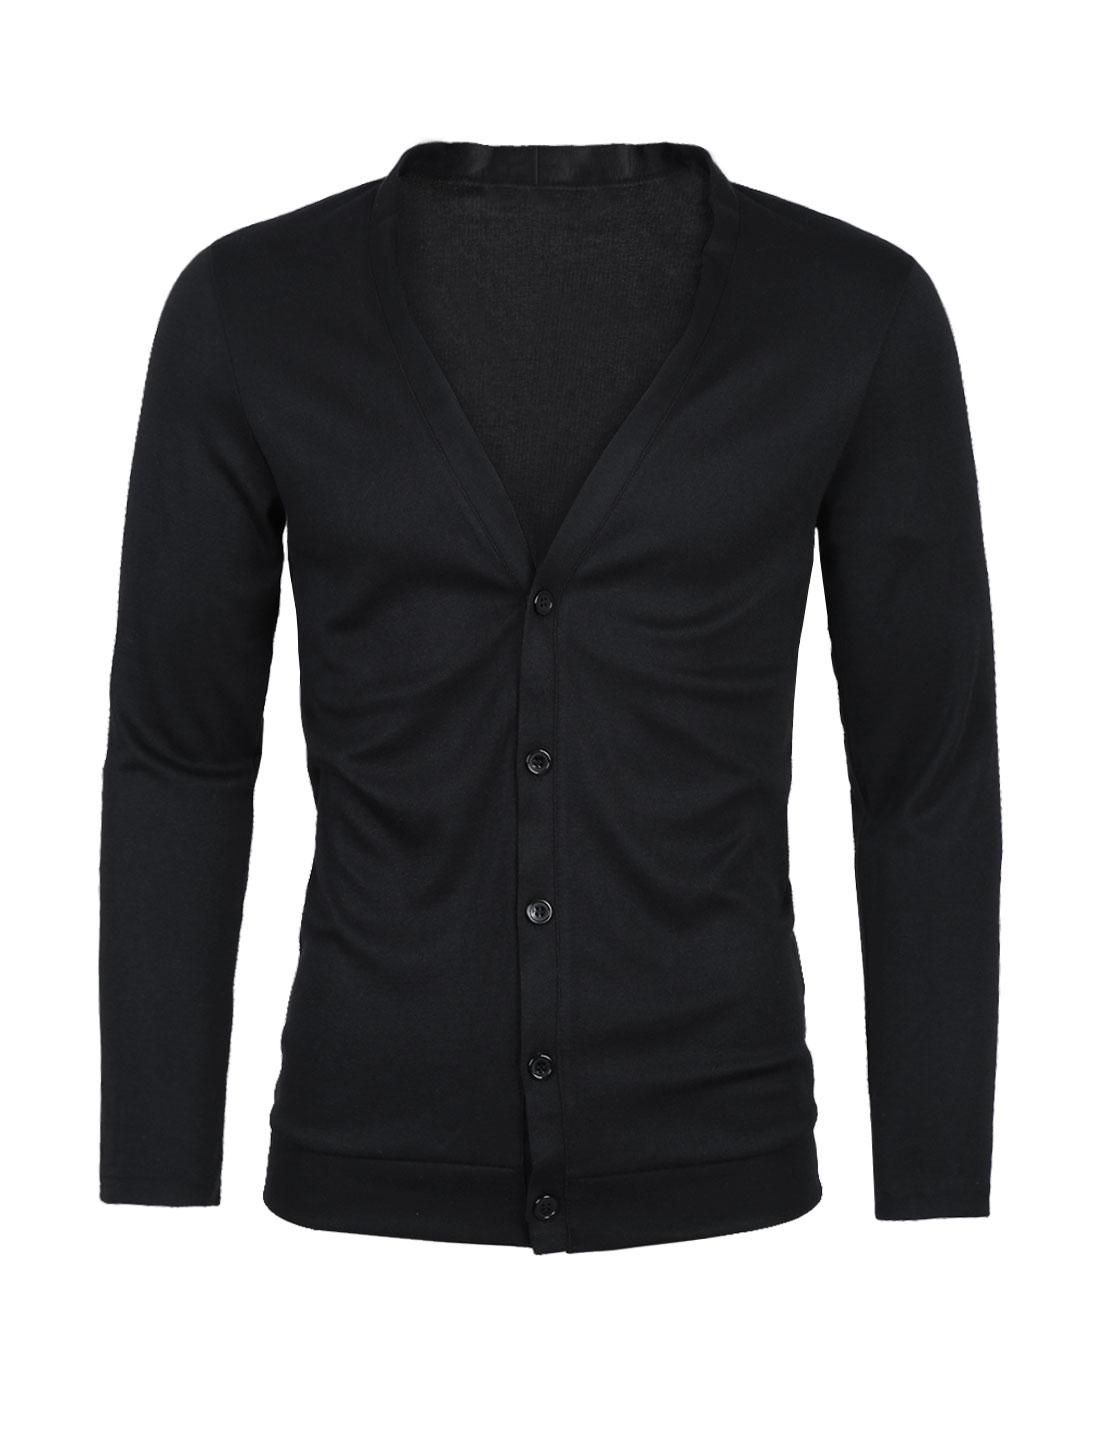 Men Deep V Neck Long Sleeves Button Down Slim Fit Cardigan Black S